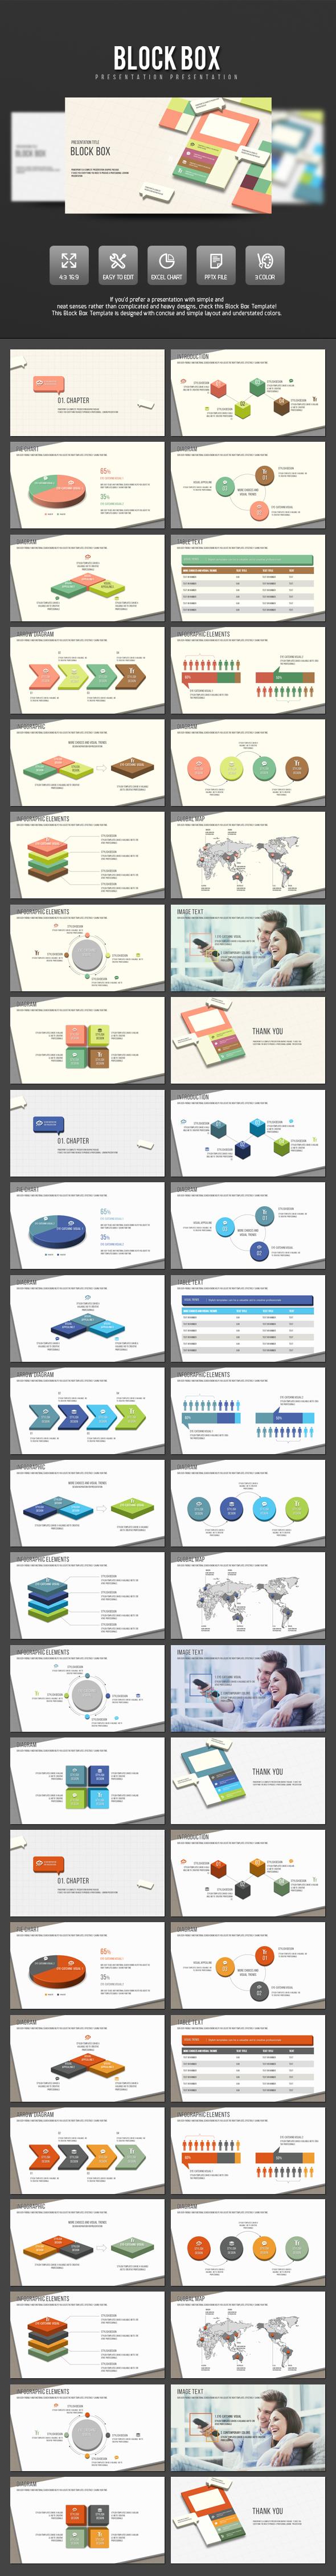 Block Box  - PowerPoint Templates Presentation Templates